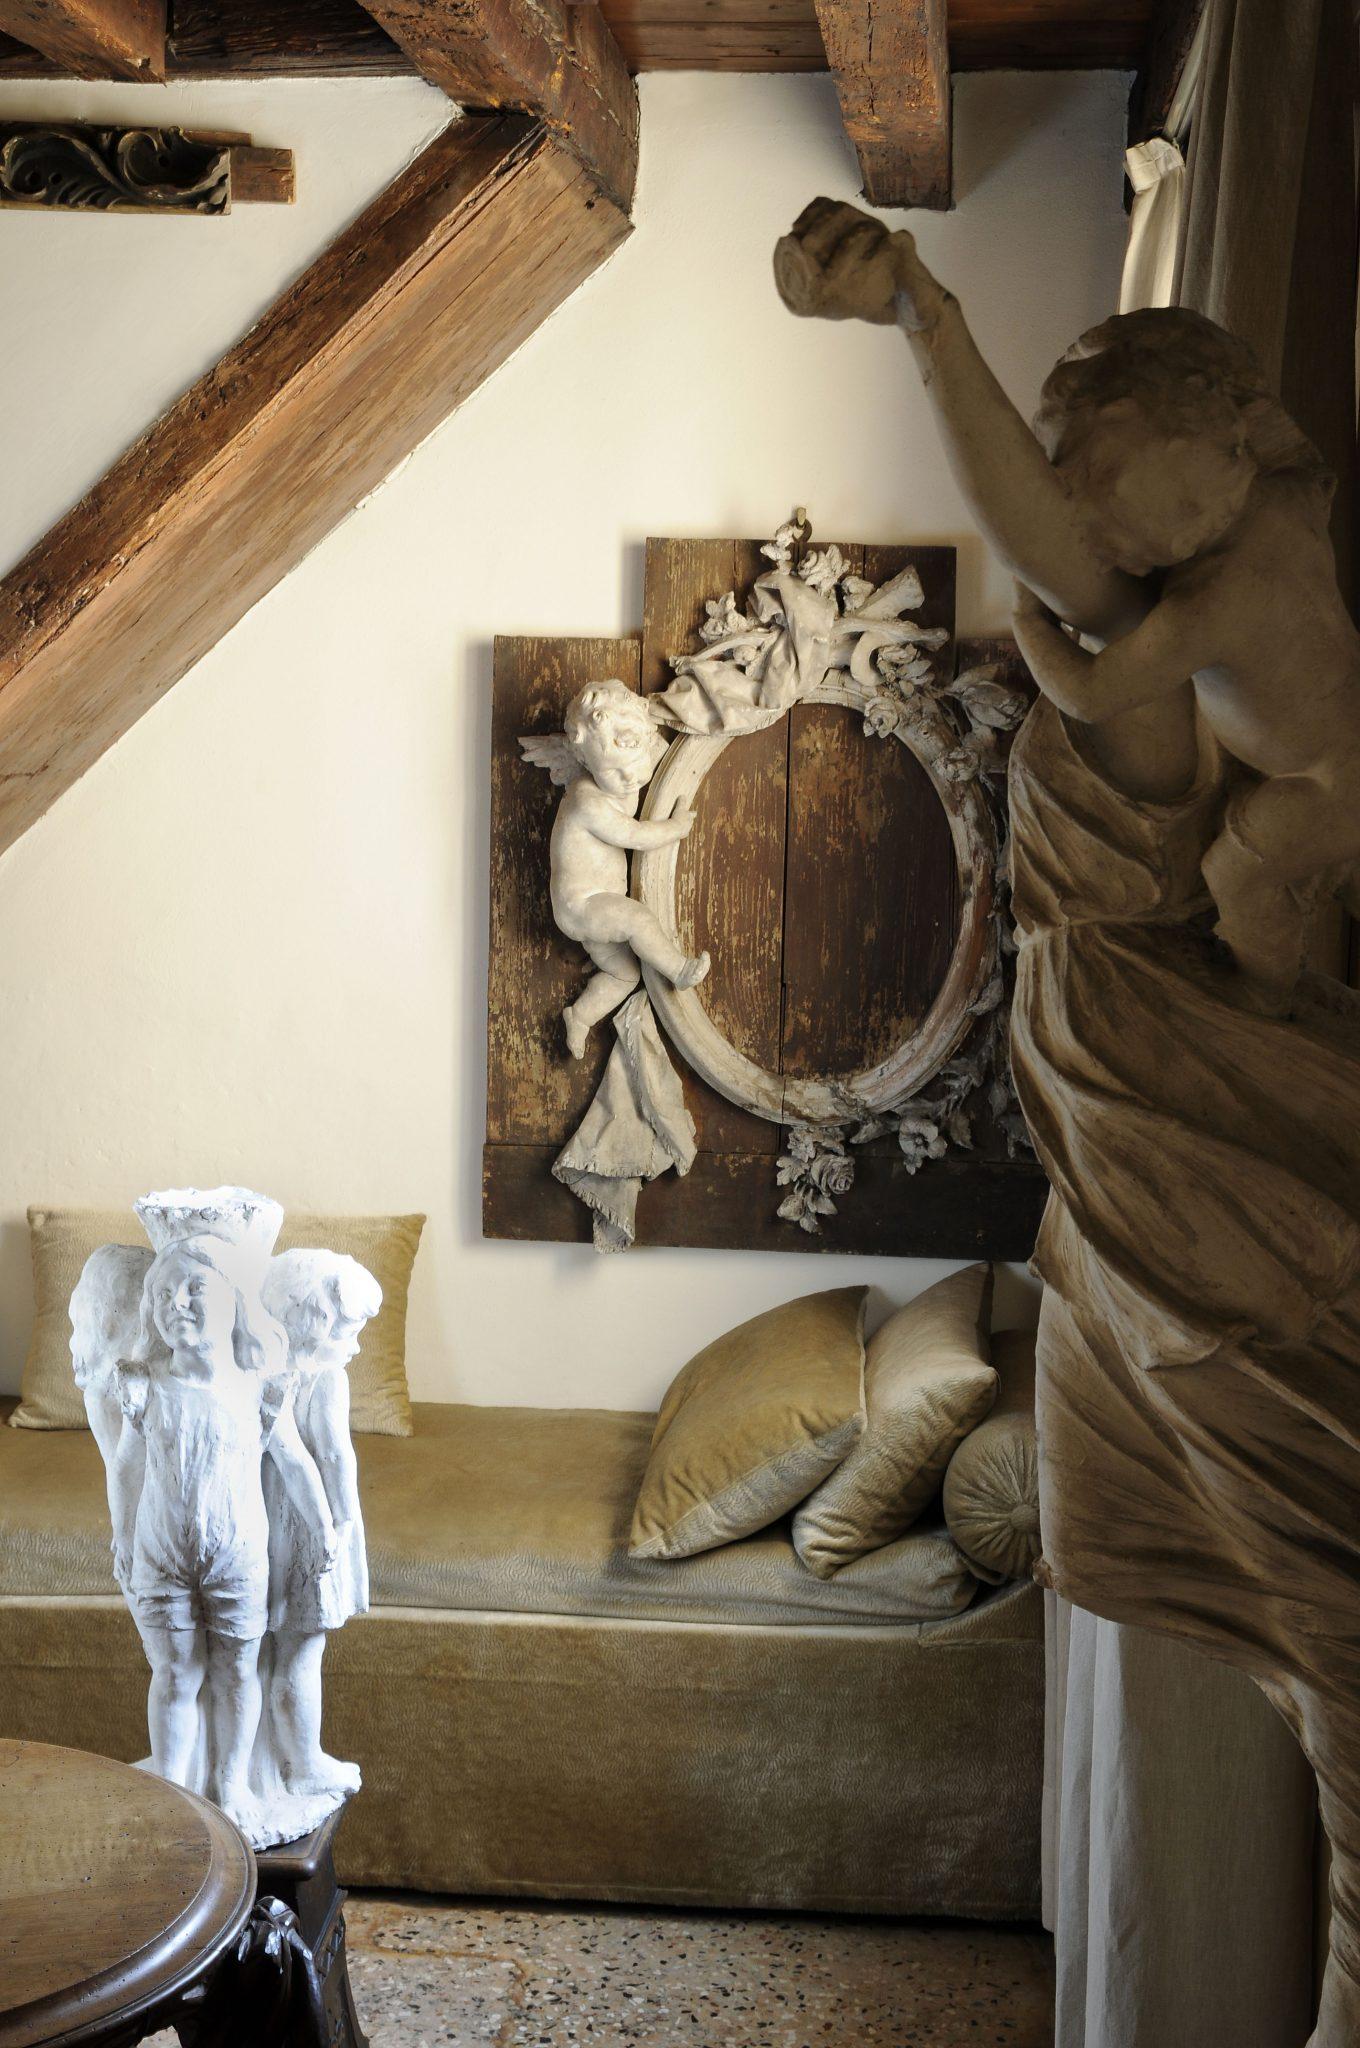 Atelier Cadorin. Una dinastia di artisti a Venezia